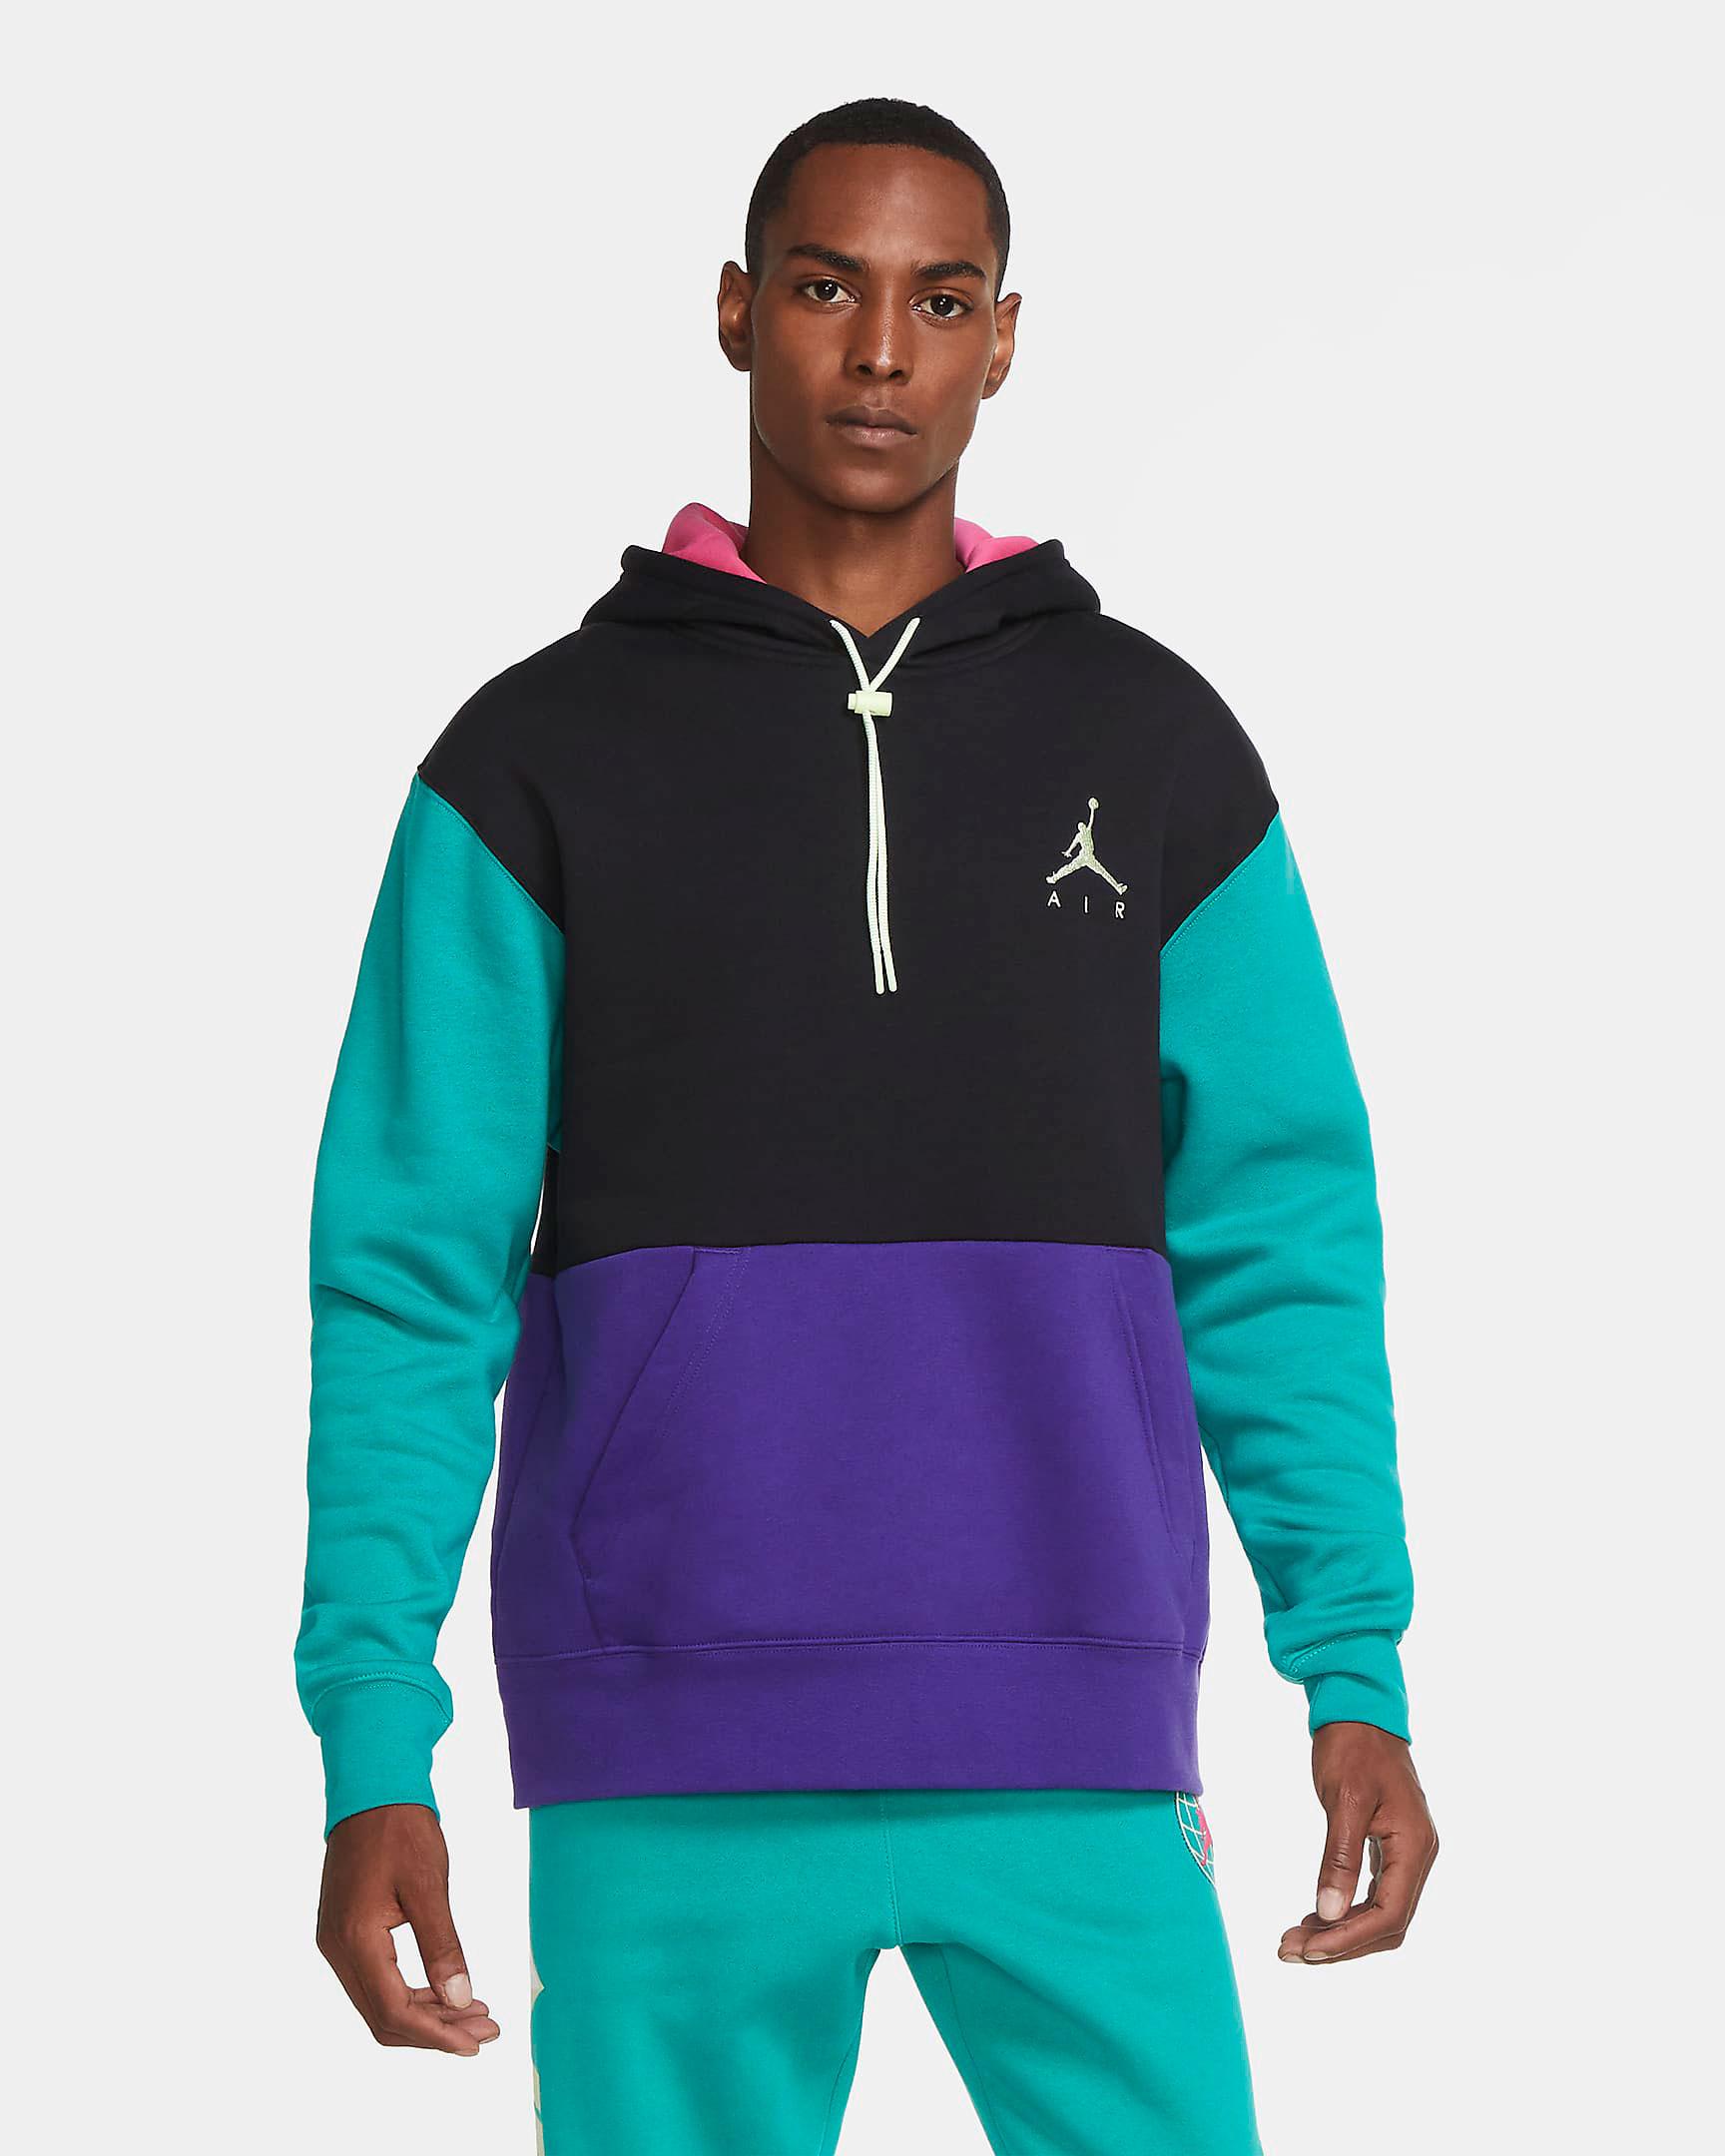 jordan-12-dark-concord-hoodie-match